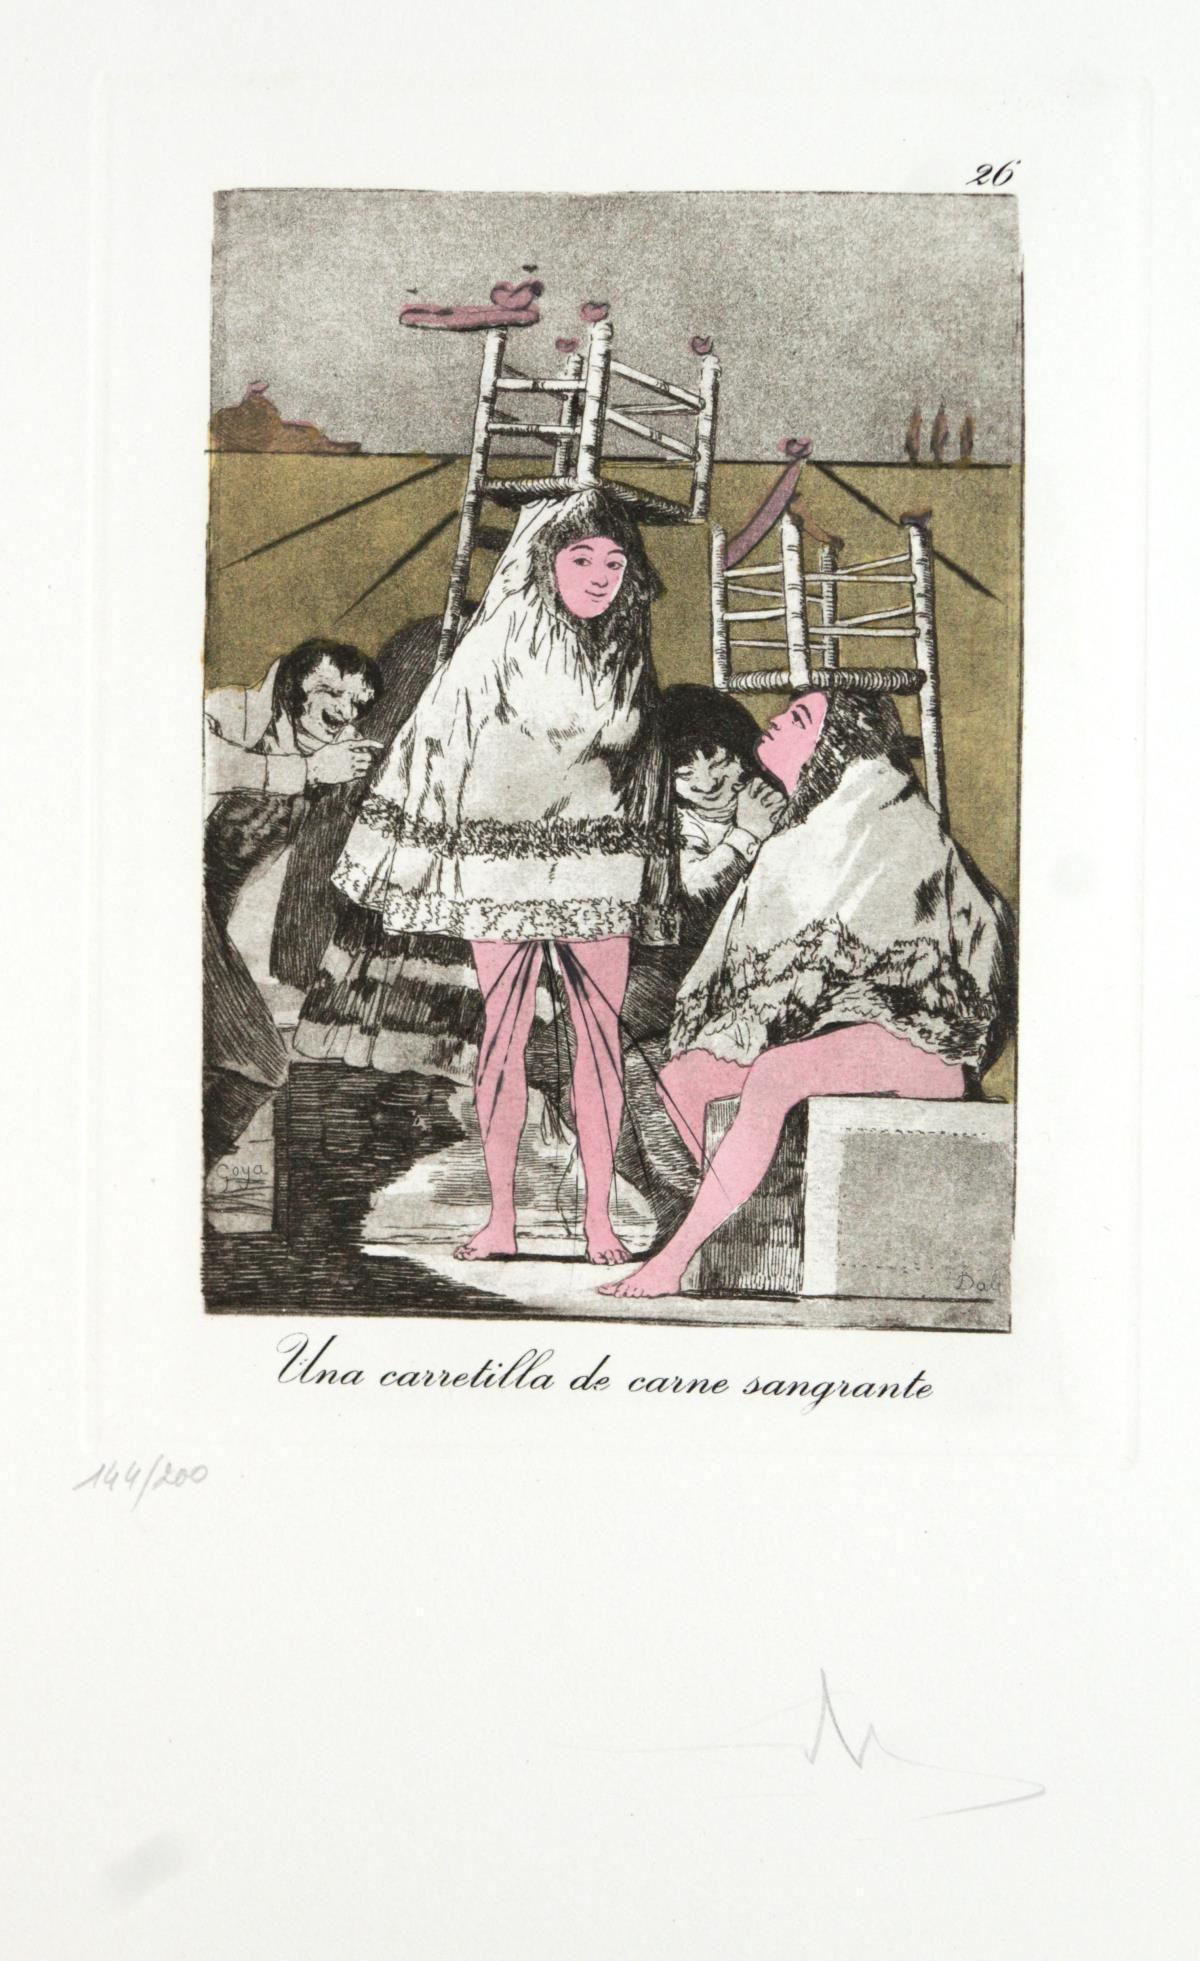 Salvador Dali - Una Carretilla de Carne Sangrante, #26